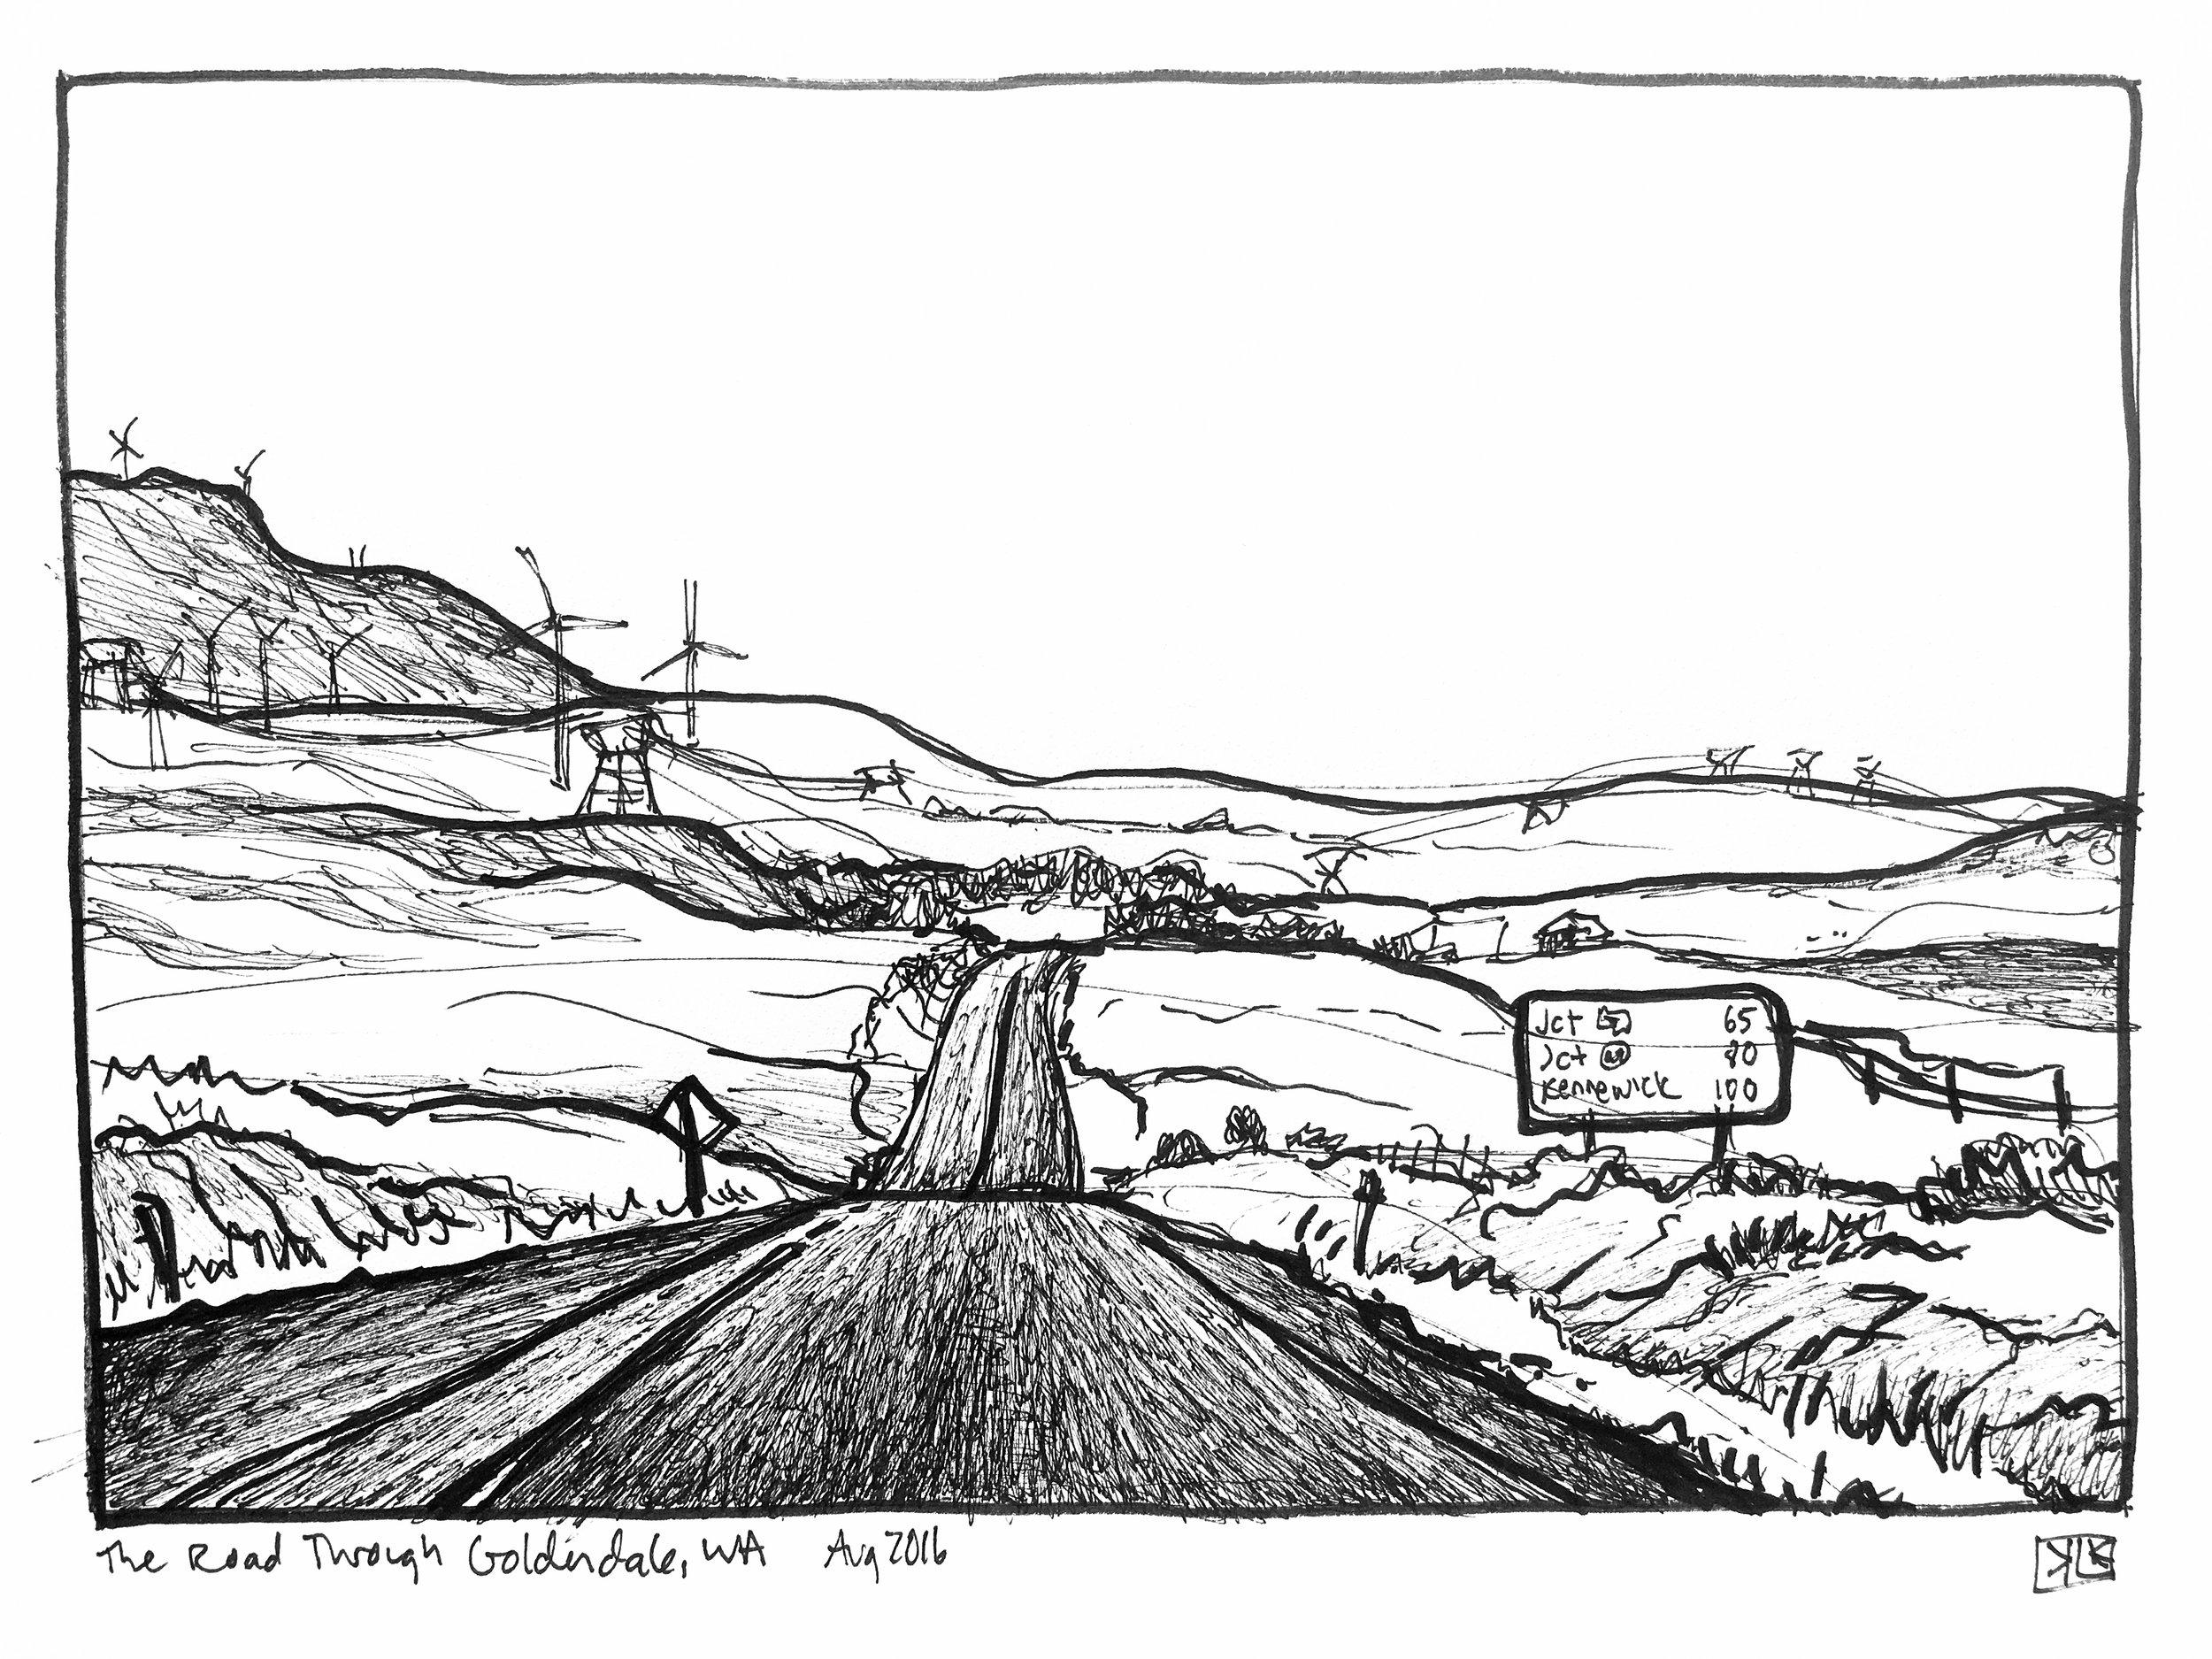 Driving through Maryhill, sketch